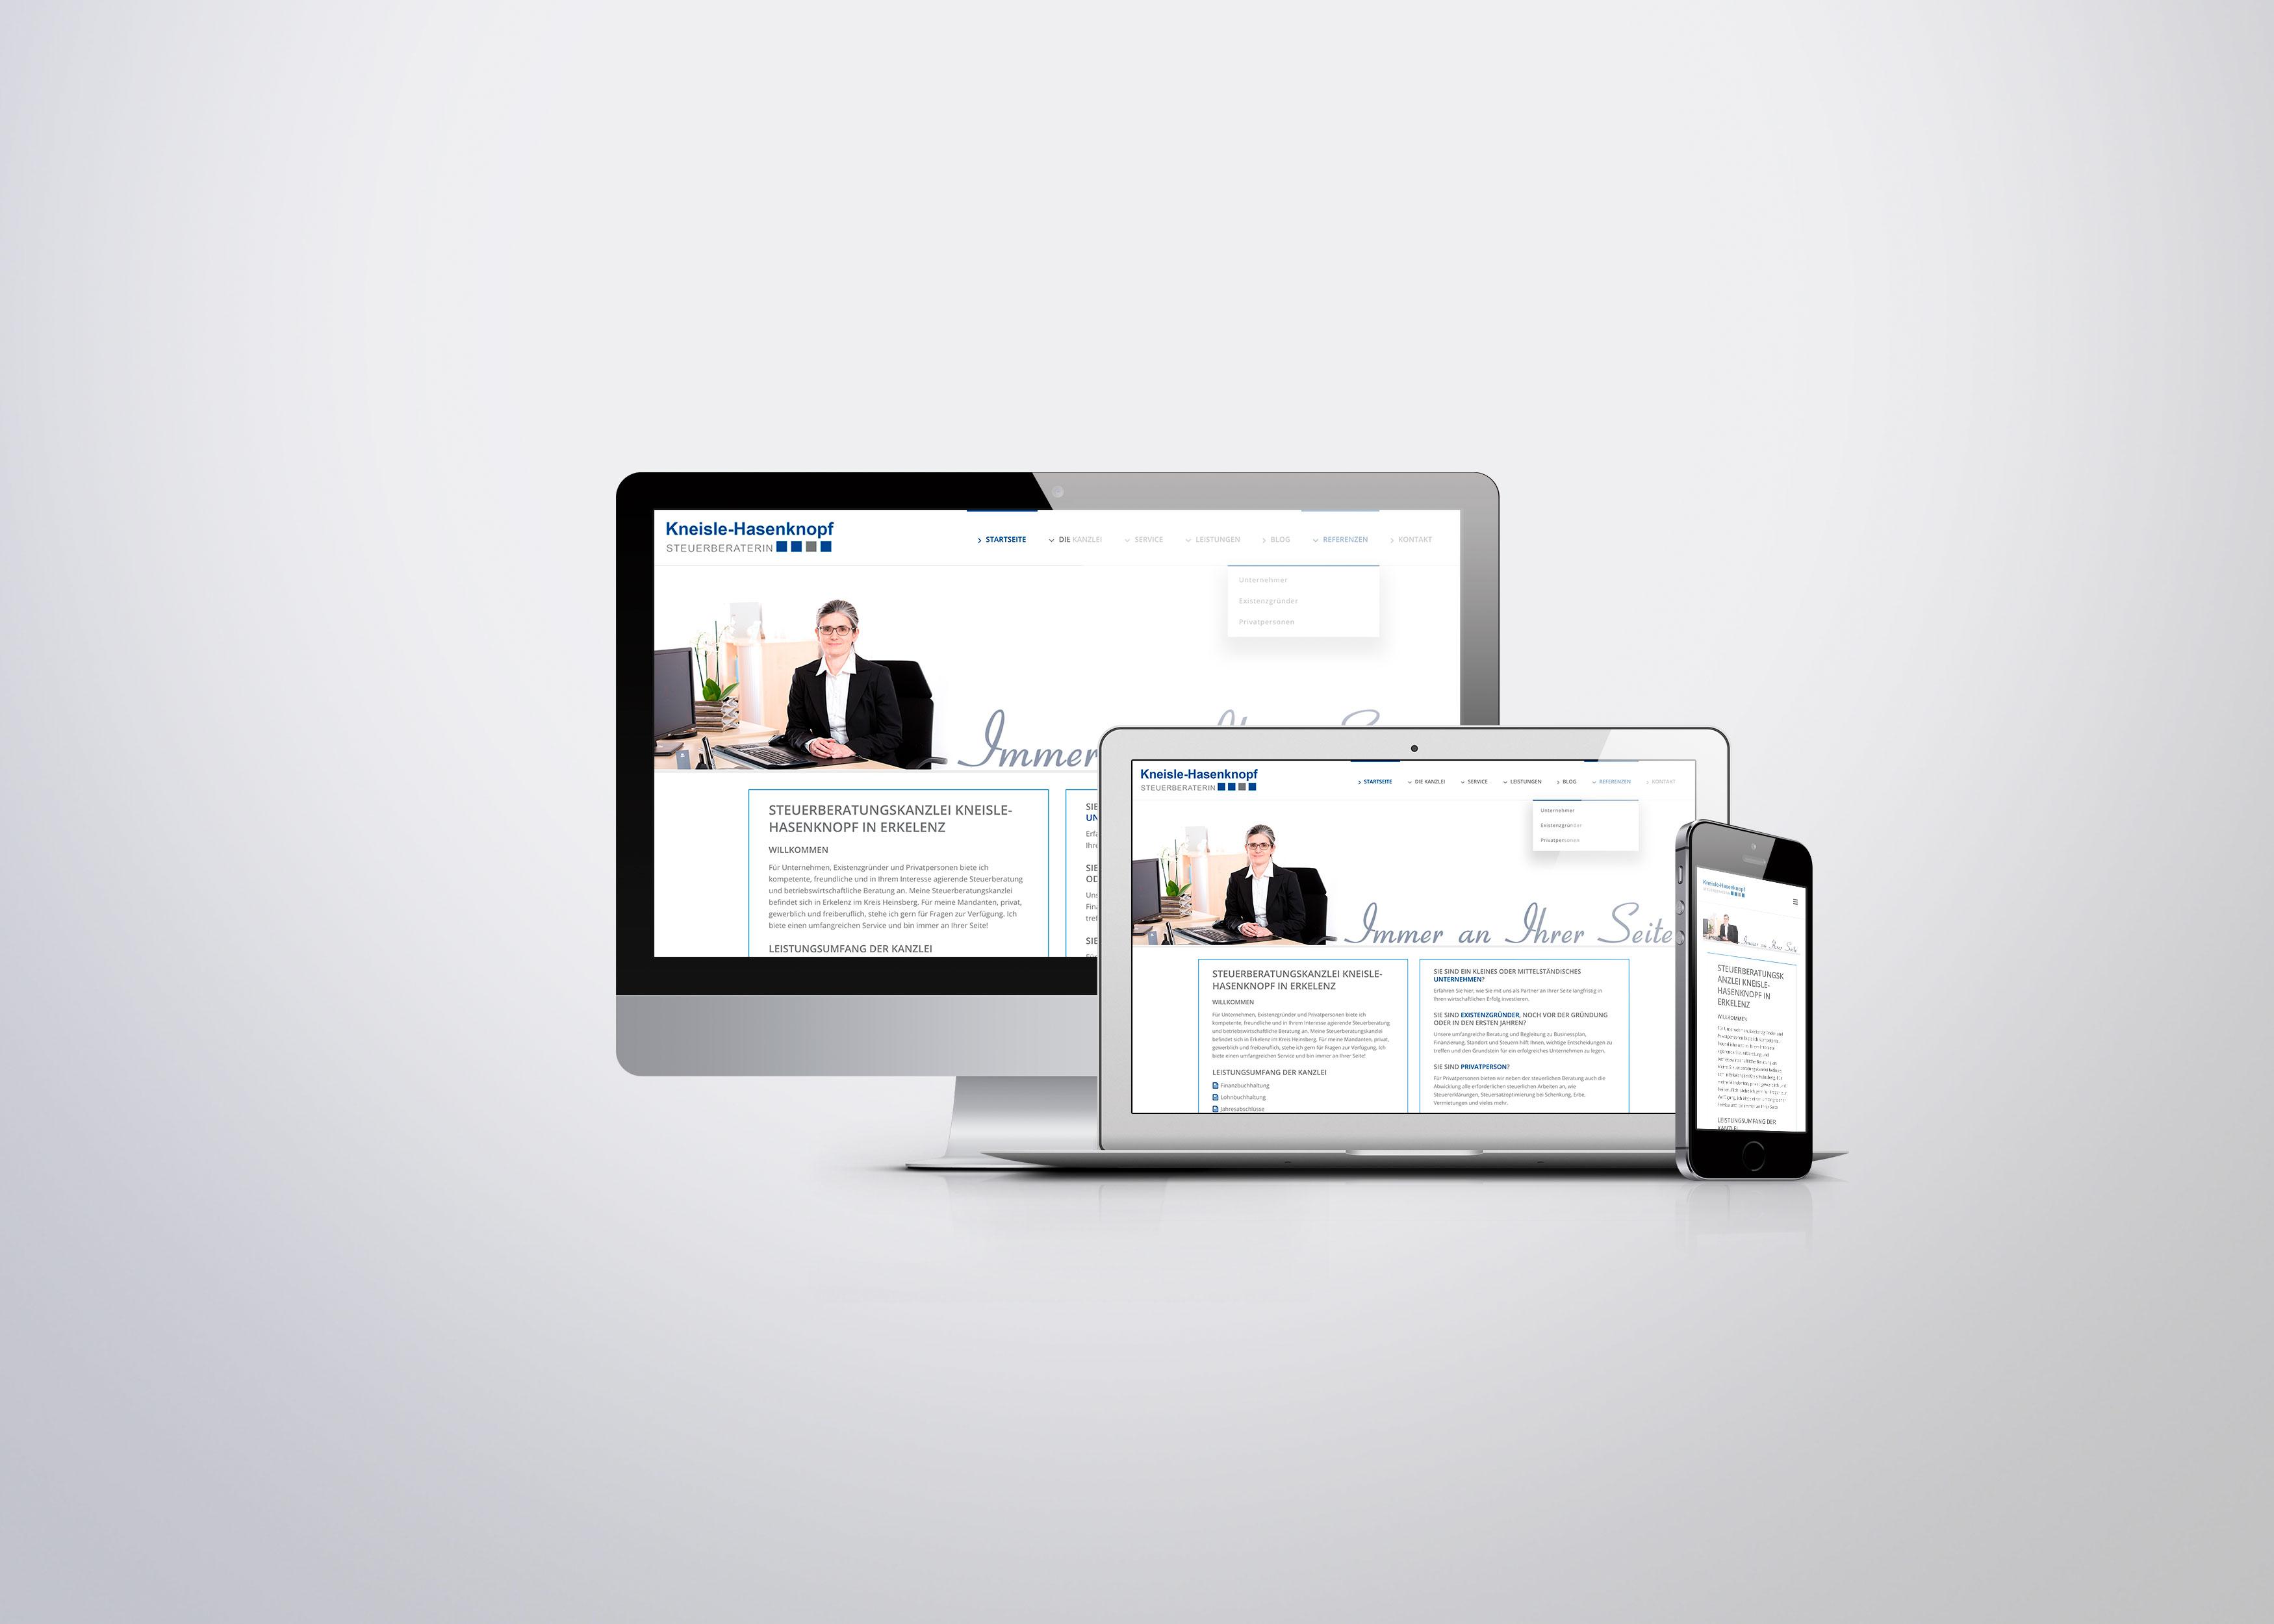 Webseite/CMS Kneisle-Hasenknopf